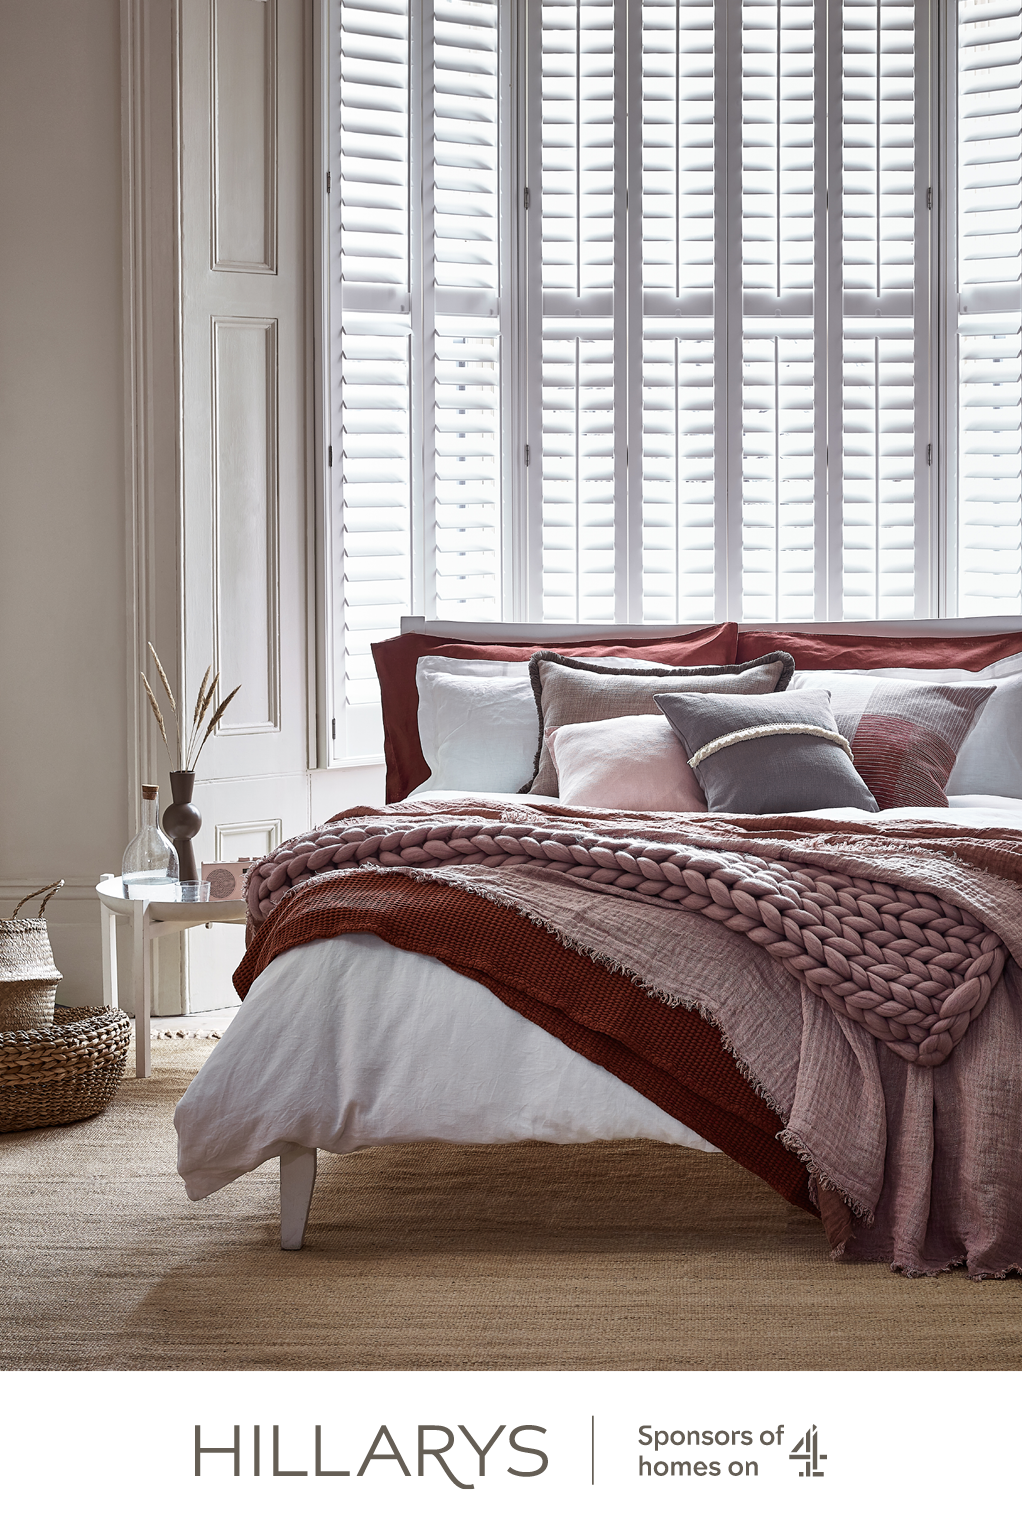 Full height shutters look sensational in bedrooms, giving